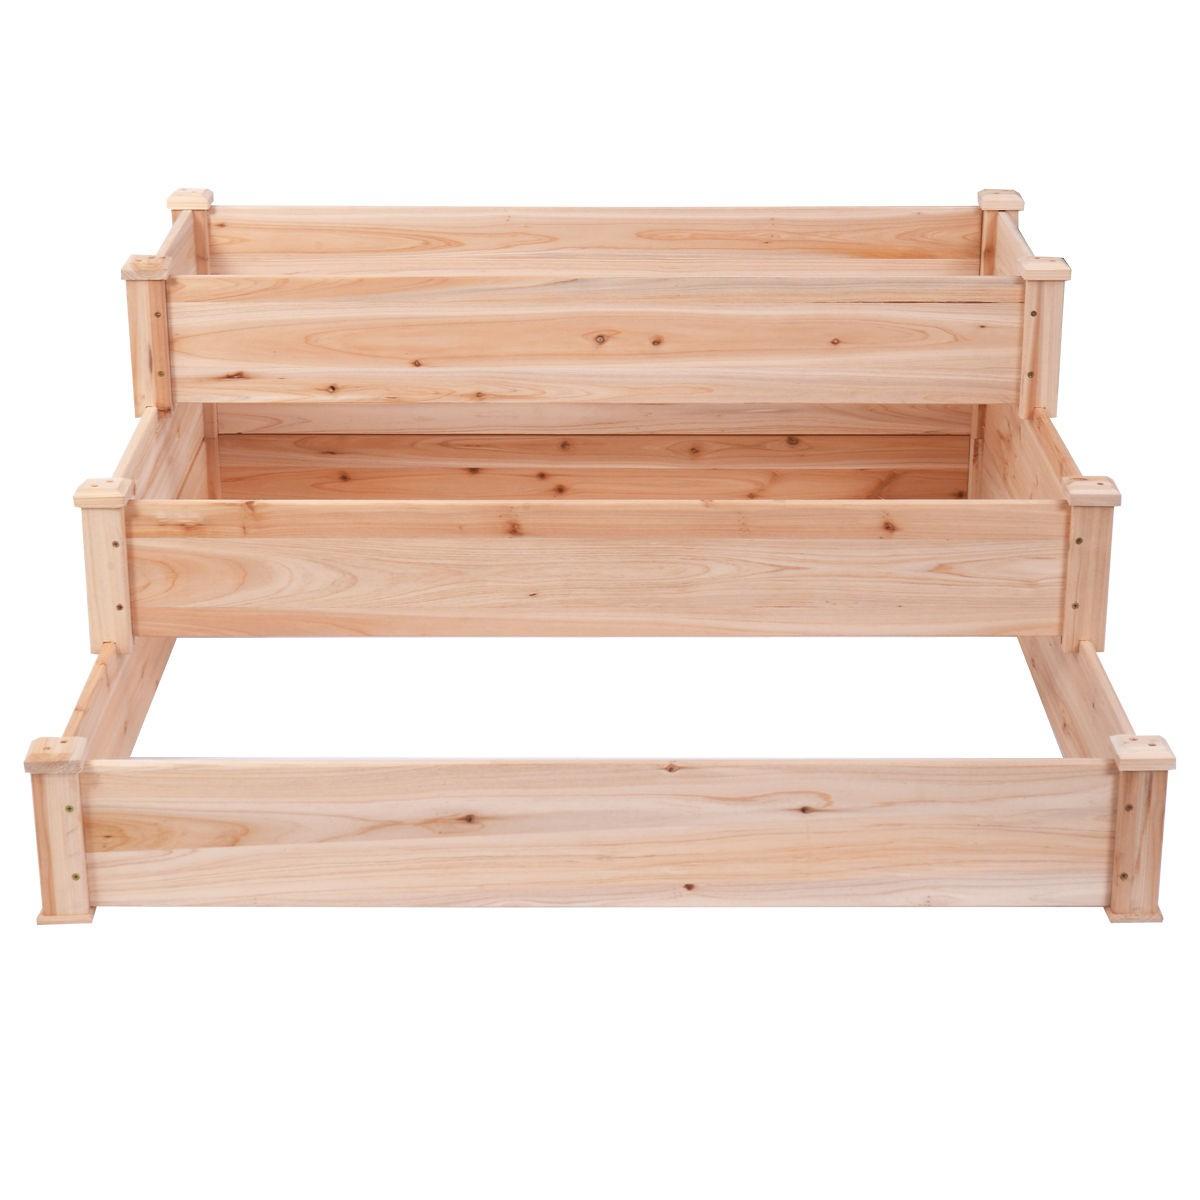 3 Tier Wooden Elevated Raised Vegetable Garden Bed Planter